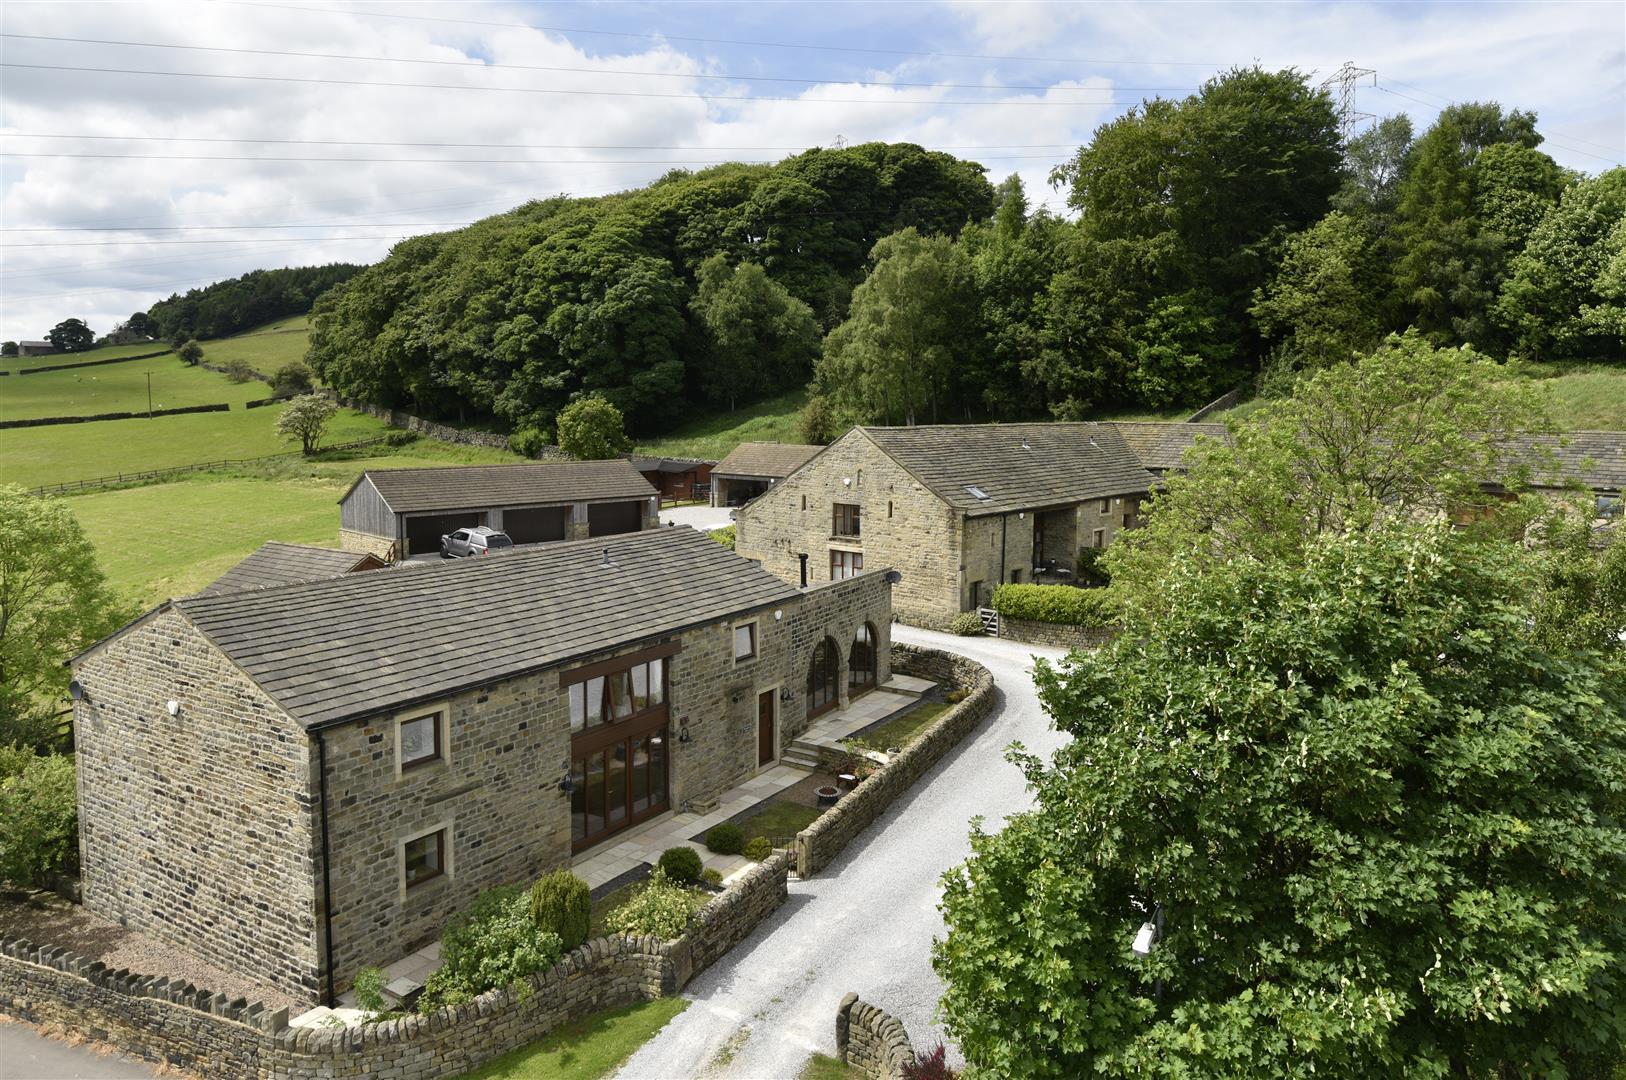 Blantyres Barn, Hill End Lane, Harden, Bingley, BD16 1DE